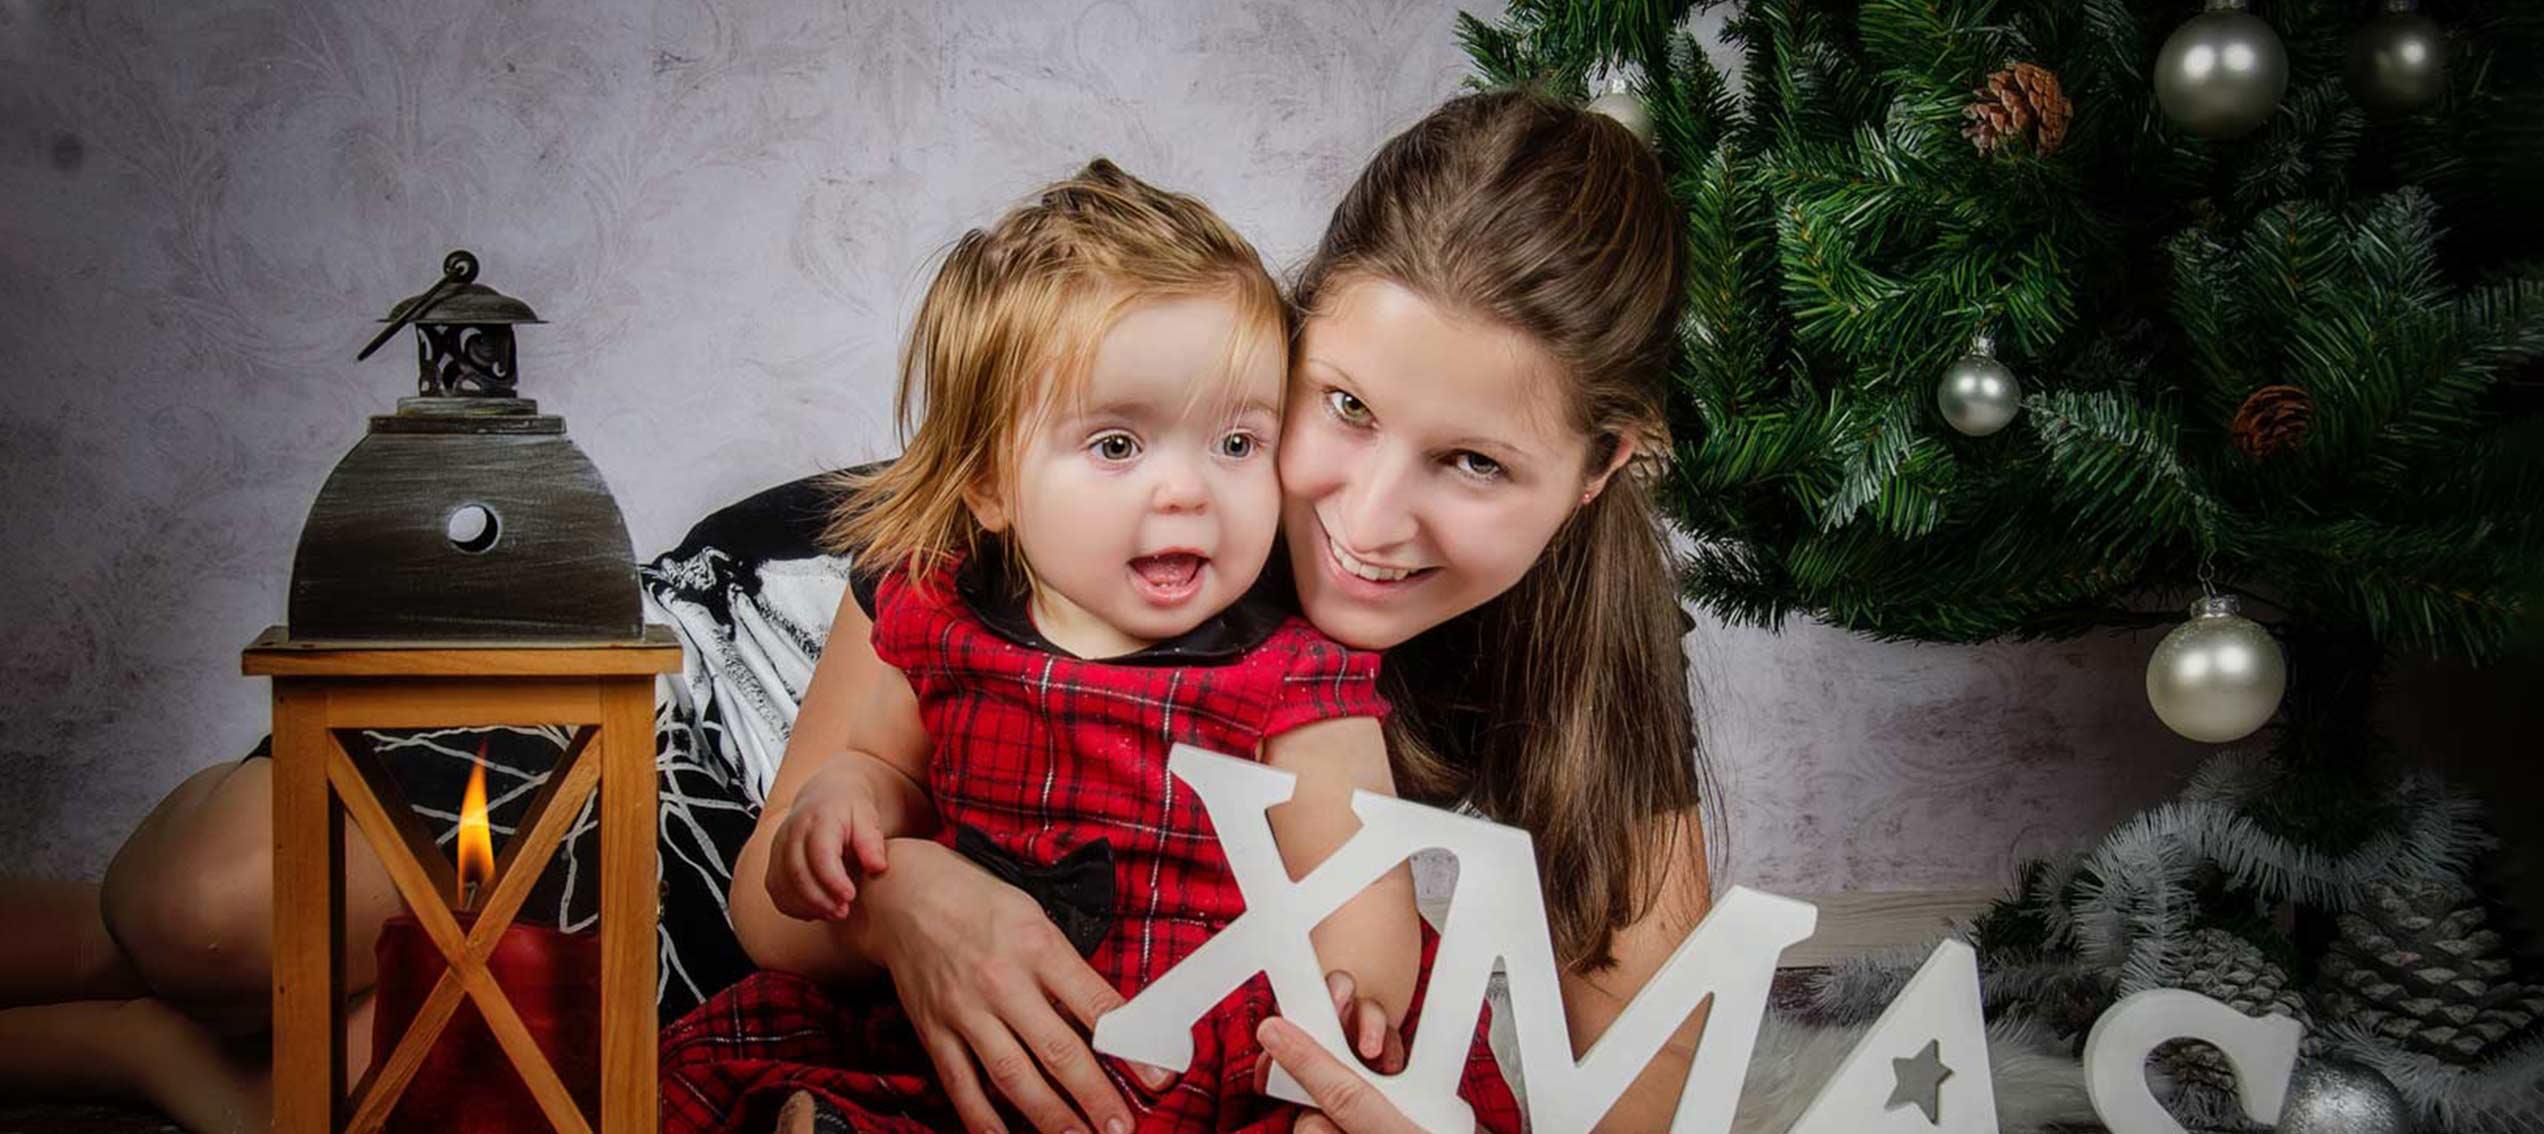 True-Creative-Agency-Familienportraits-4-1